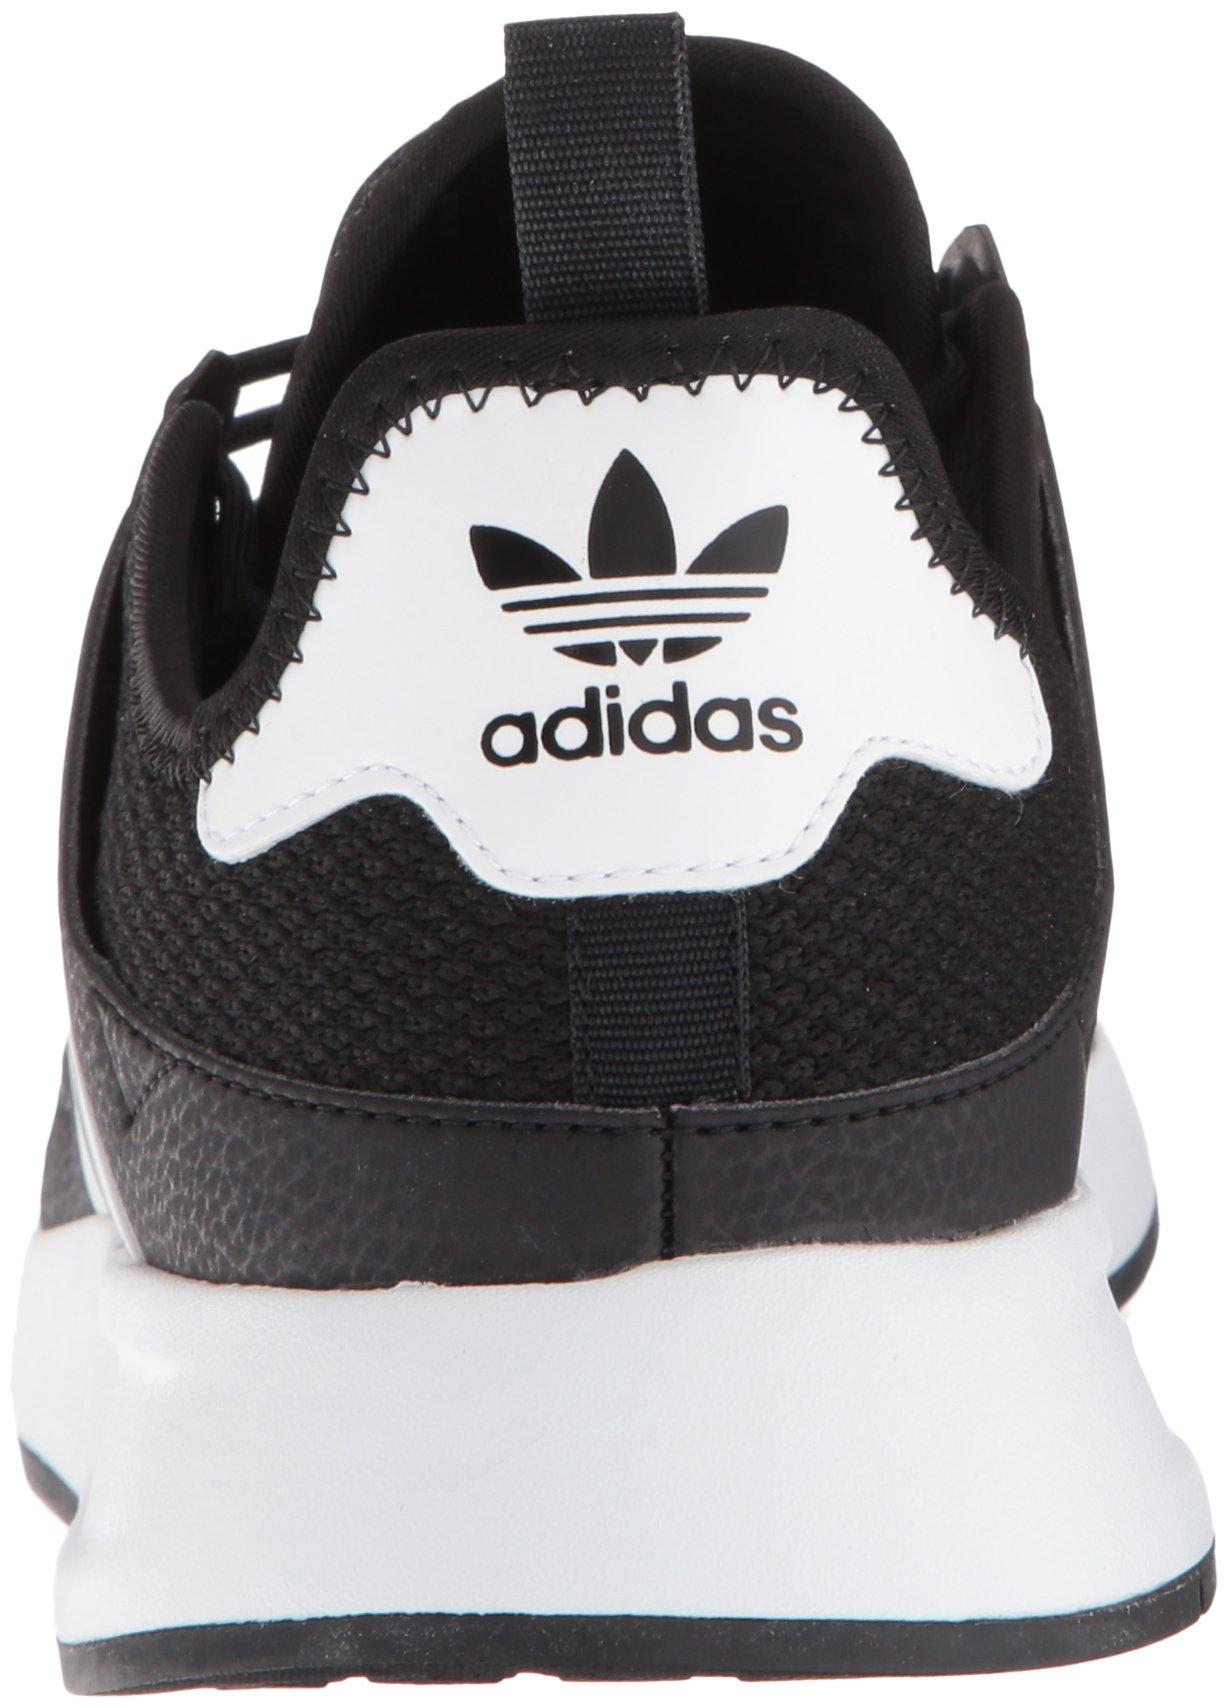 adidas Originals Mens X_PLR Running Shoe White/Black, 4.5 M US by adidas Originals (Image #2)